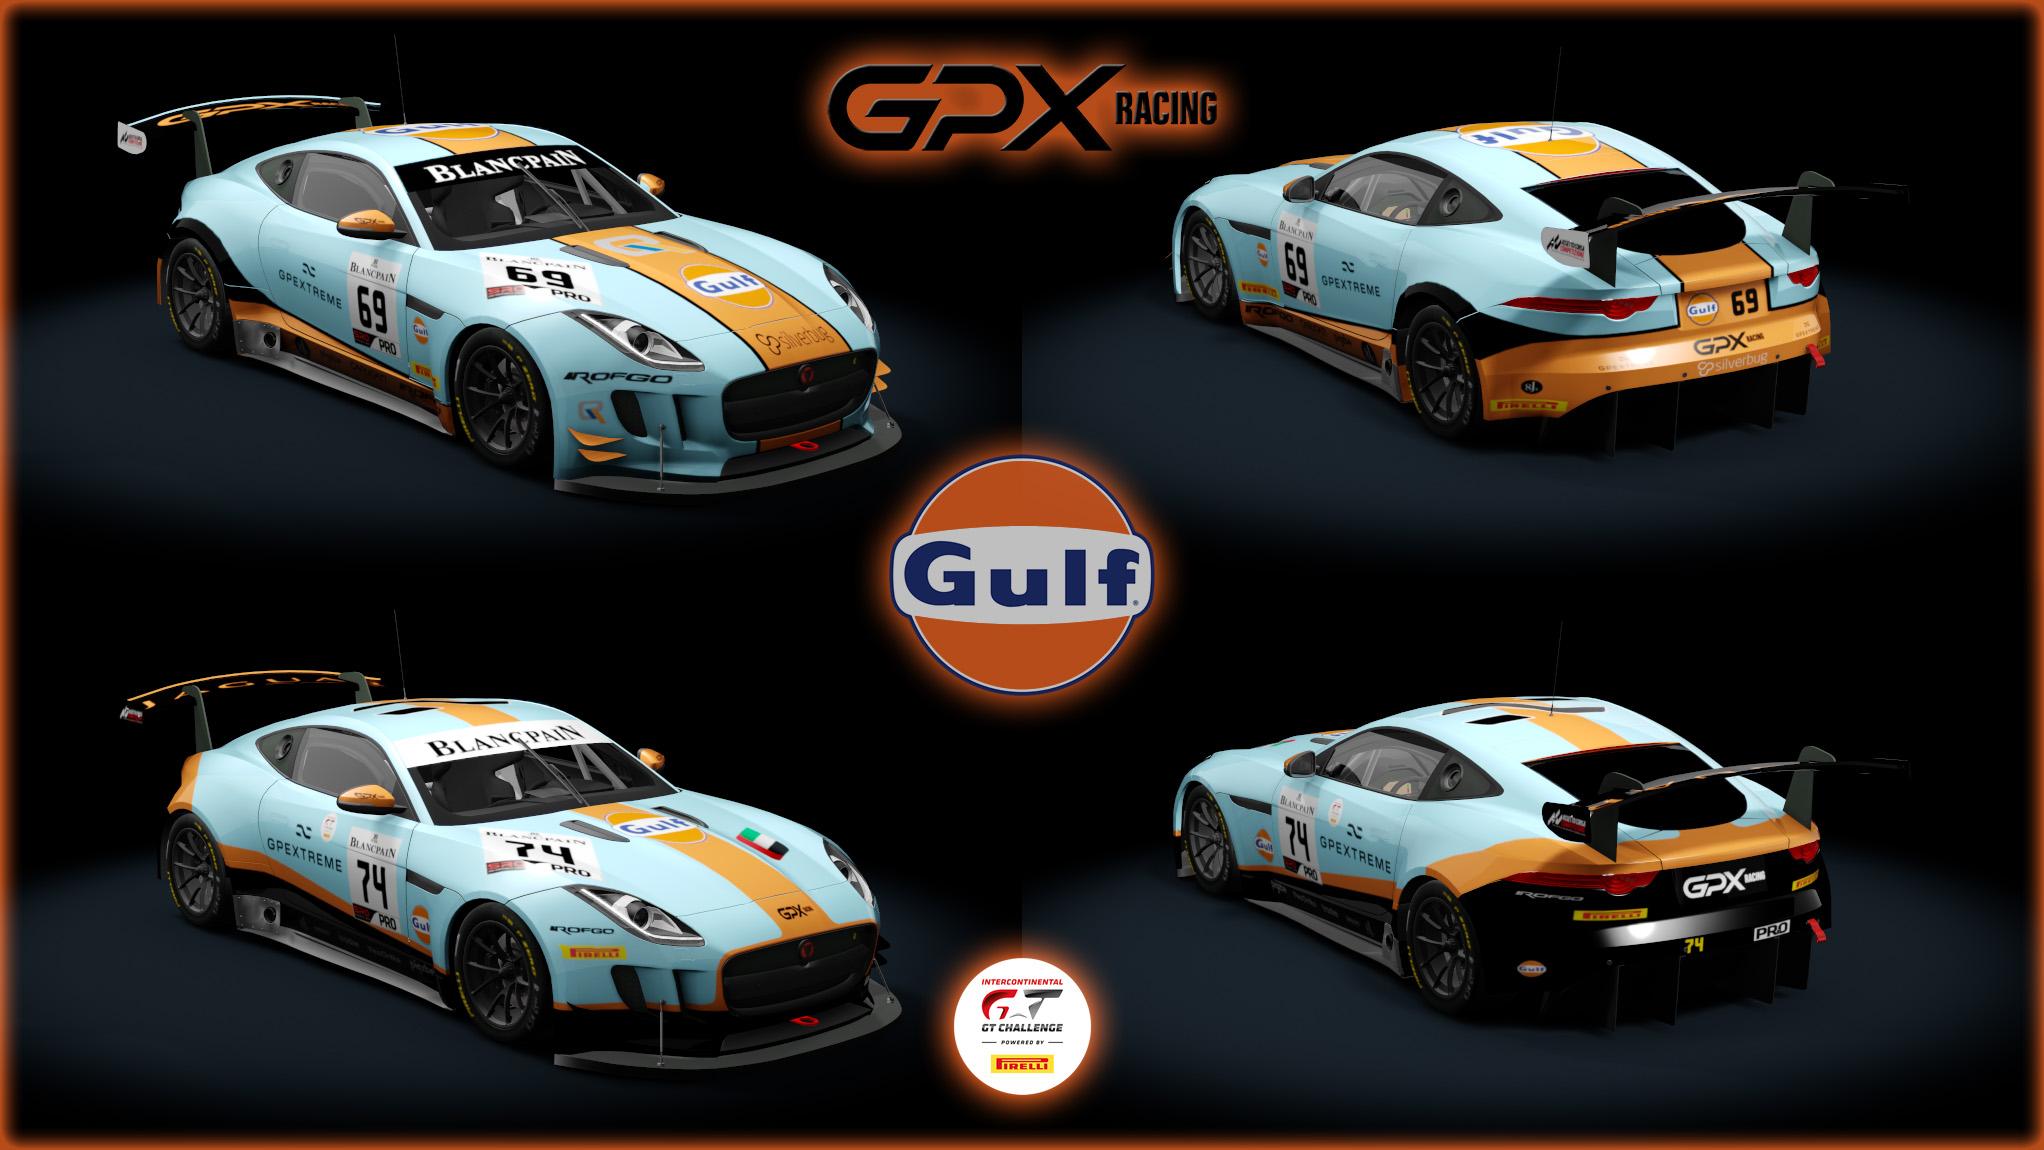 AG_Jaguar_GT3_GPX_Racing.jpg